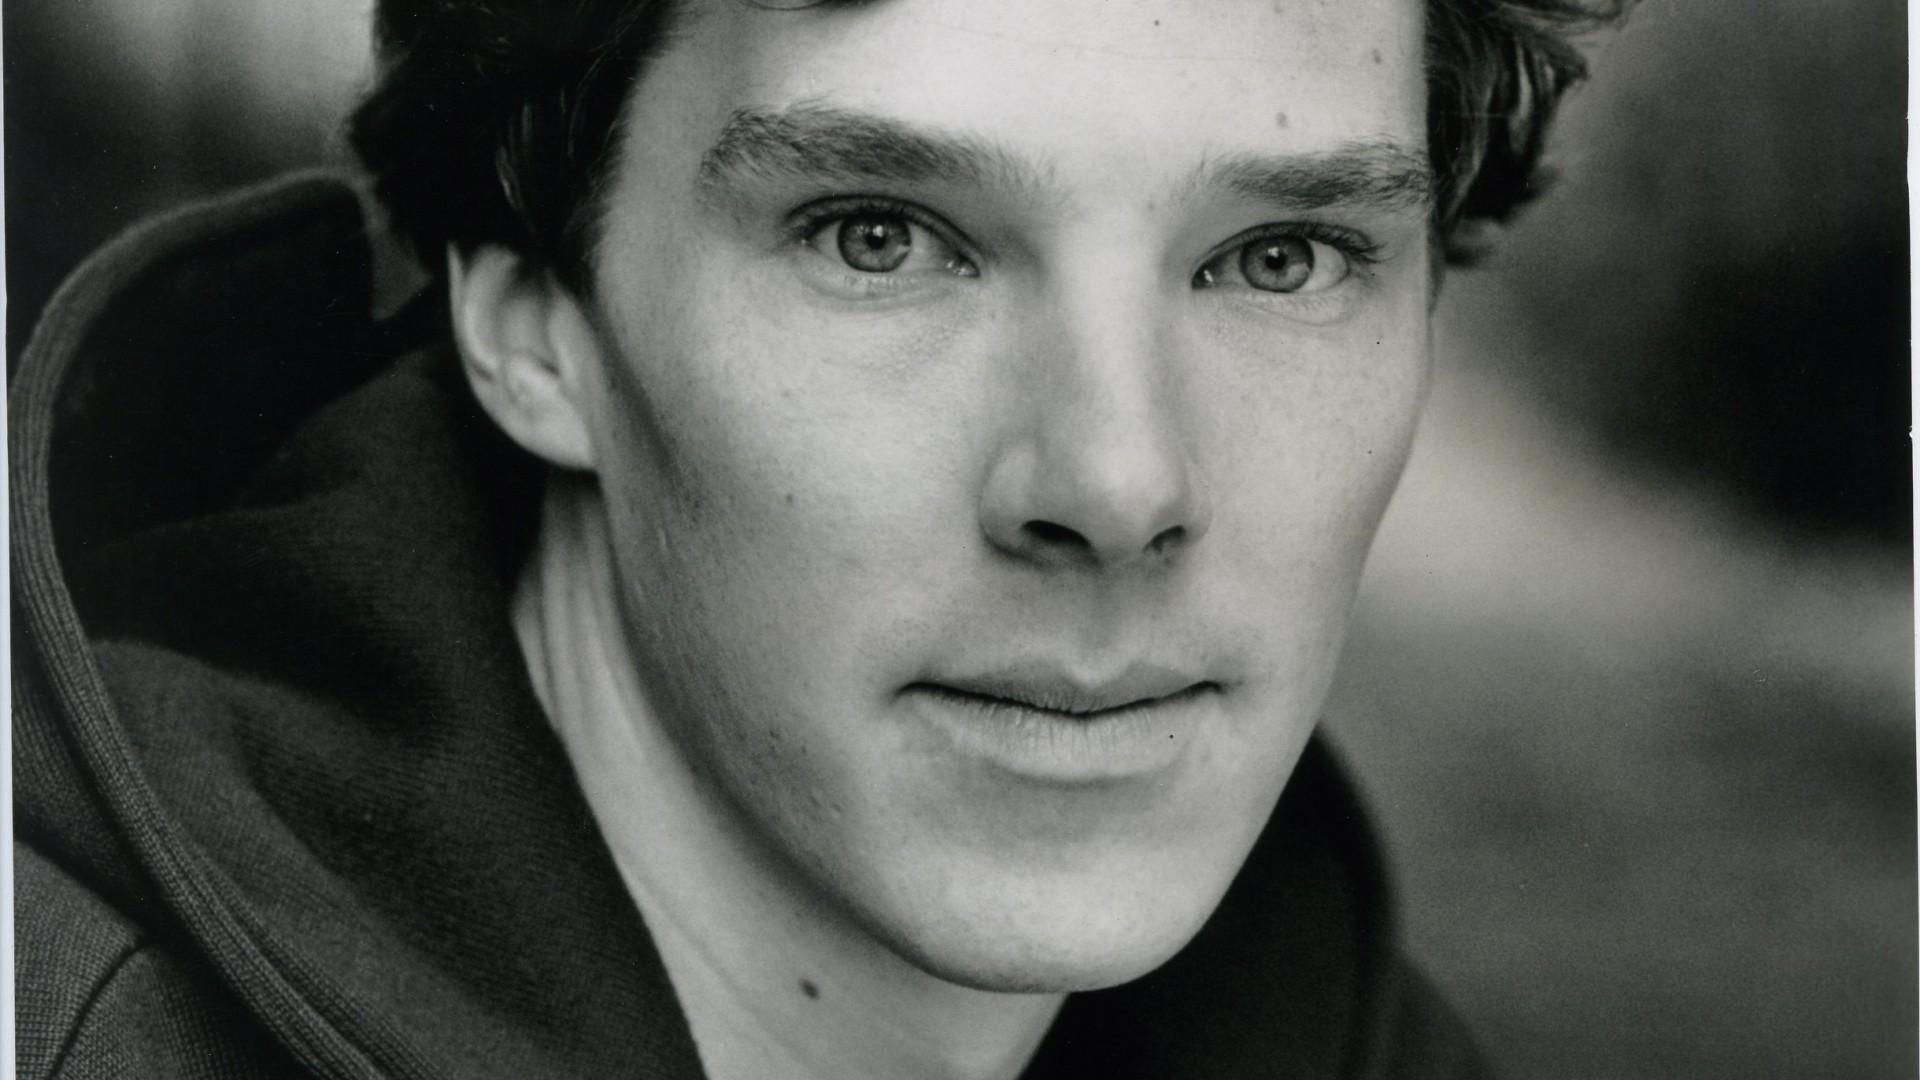 Benedict Cumberbatch – Black&White - HD Wallpapers: hippowallpapers.com/benedict-cumberbatch-wallpapers